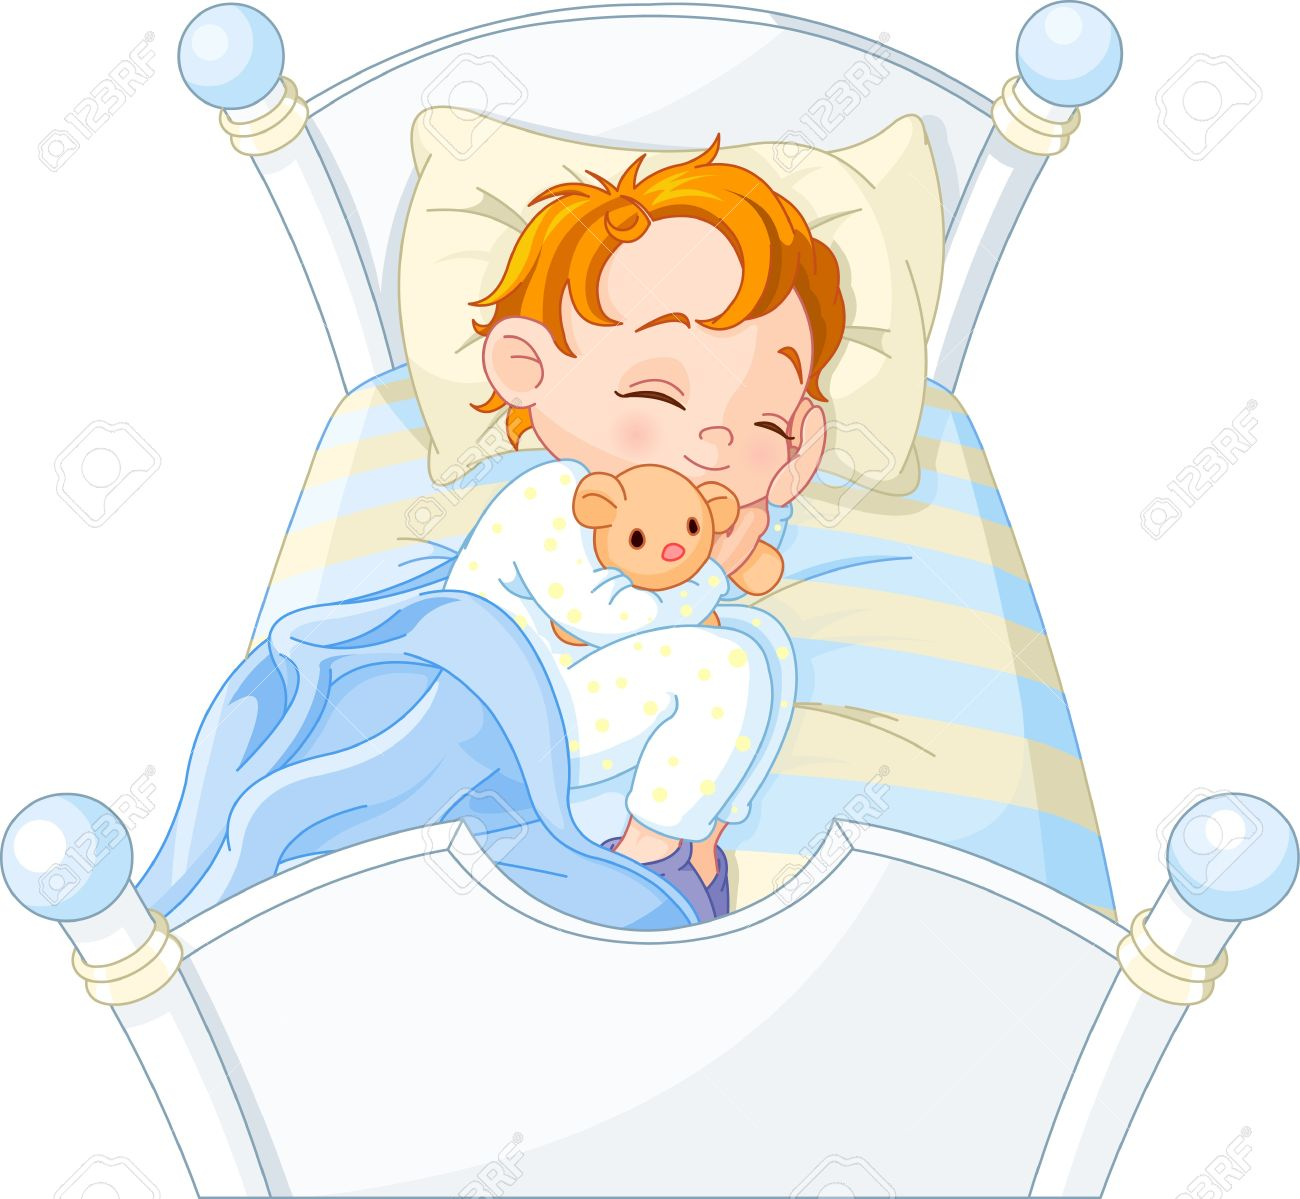 Cute little boy sleeping in his bed.